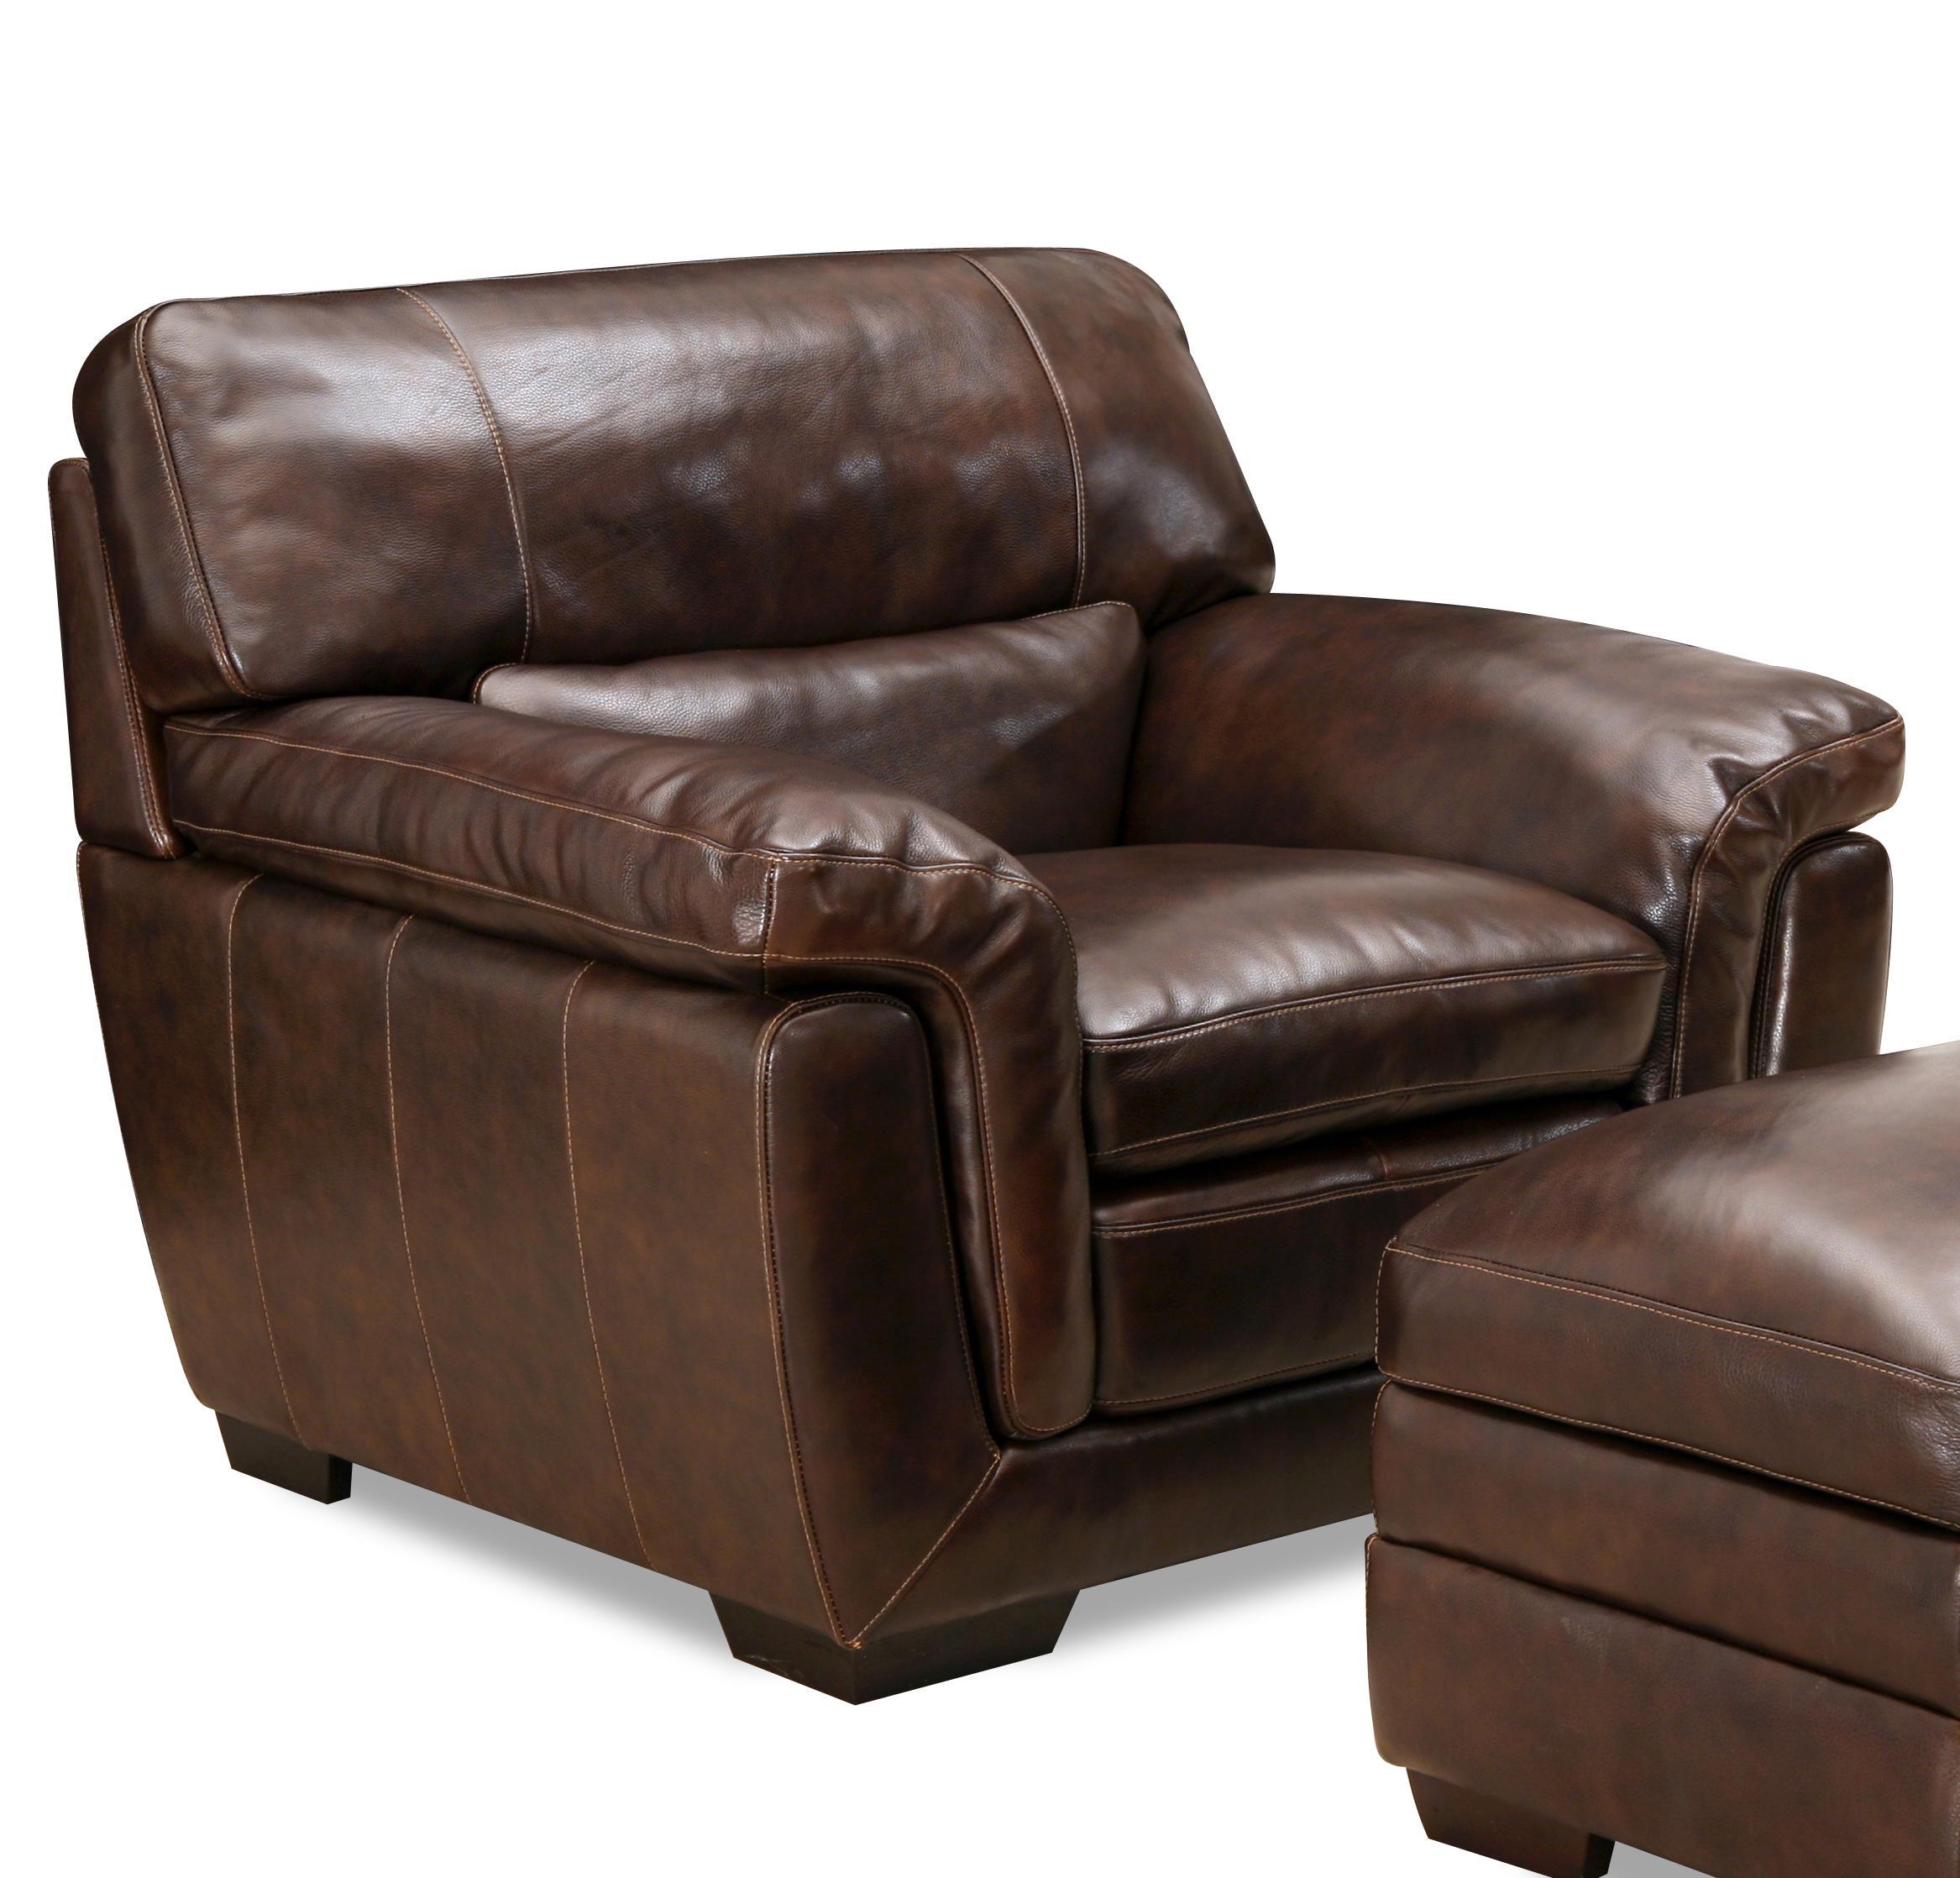 6956 Leather Chair by Simon Li at Dean Bosler's